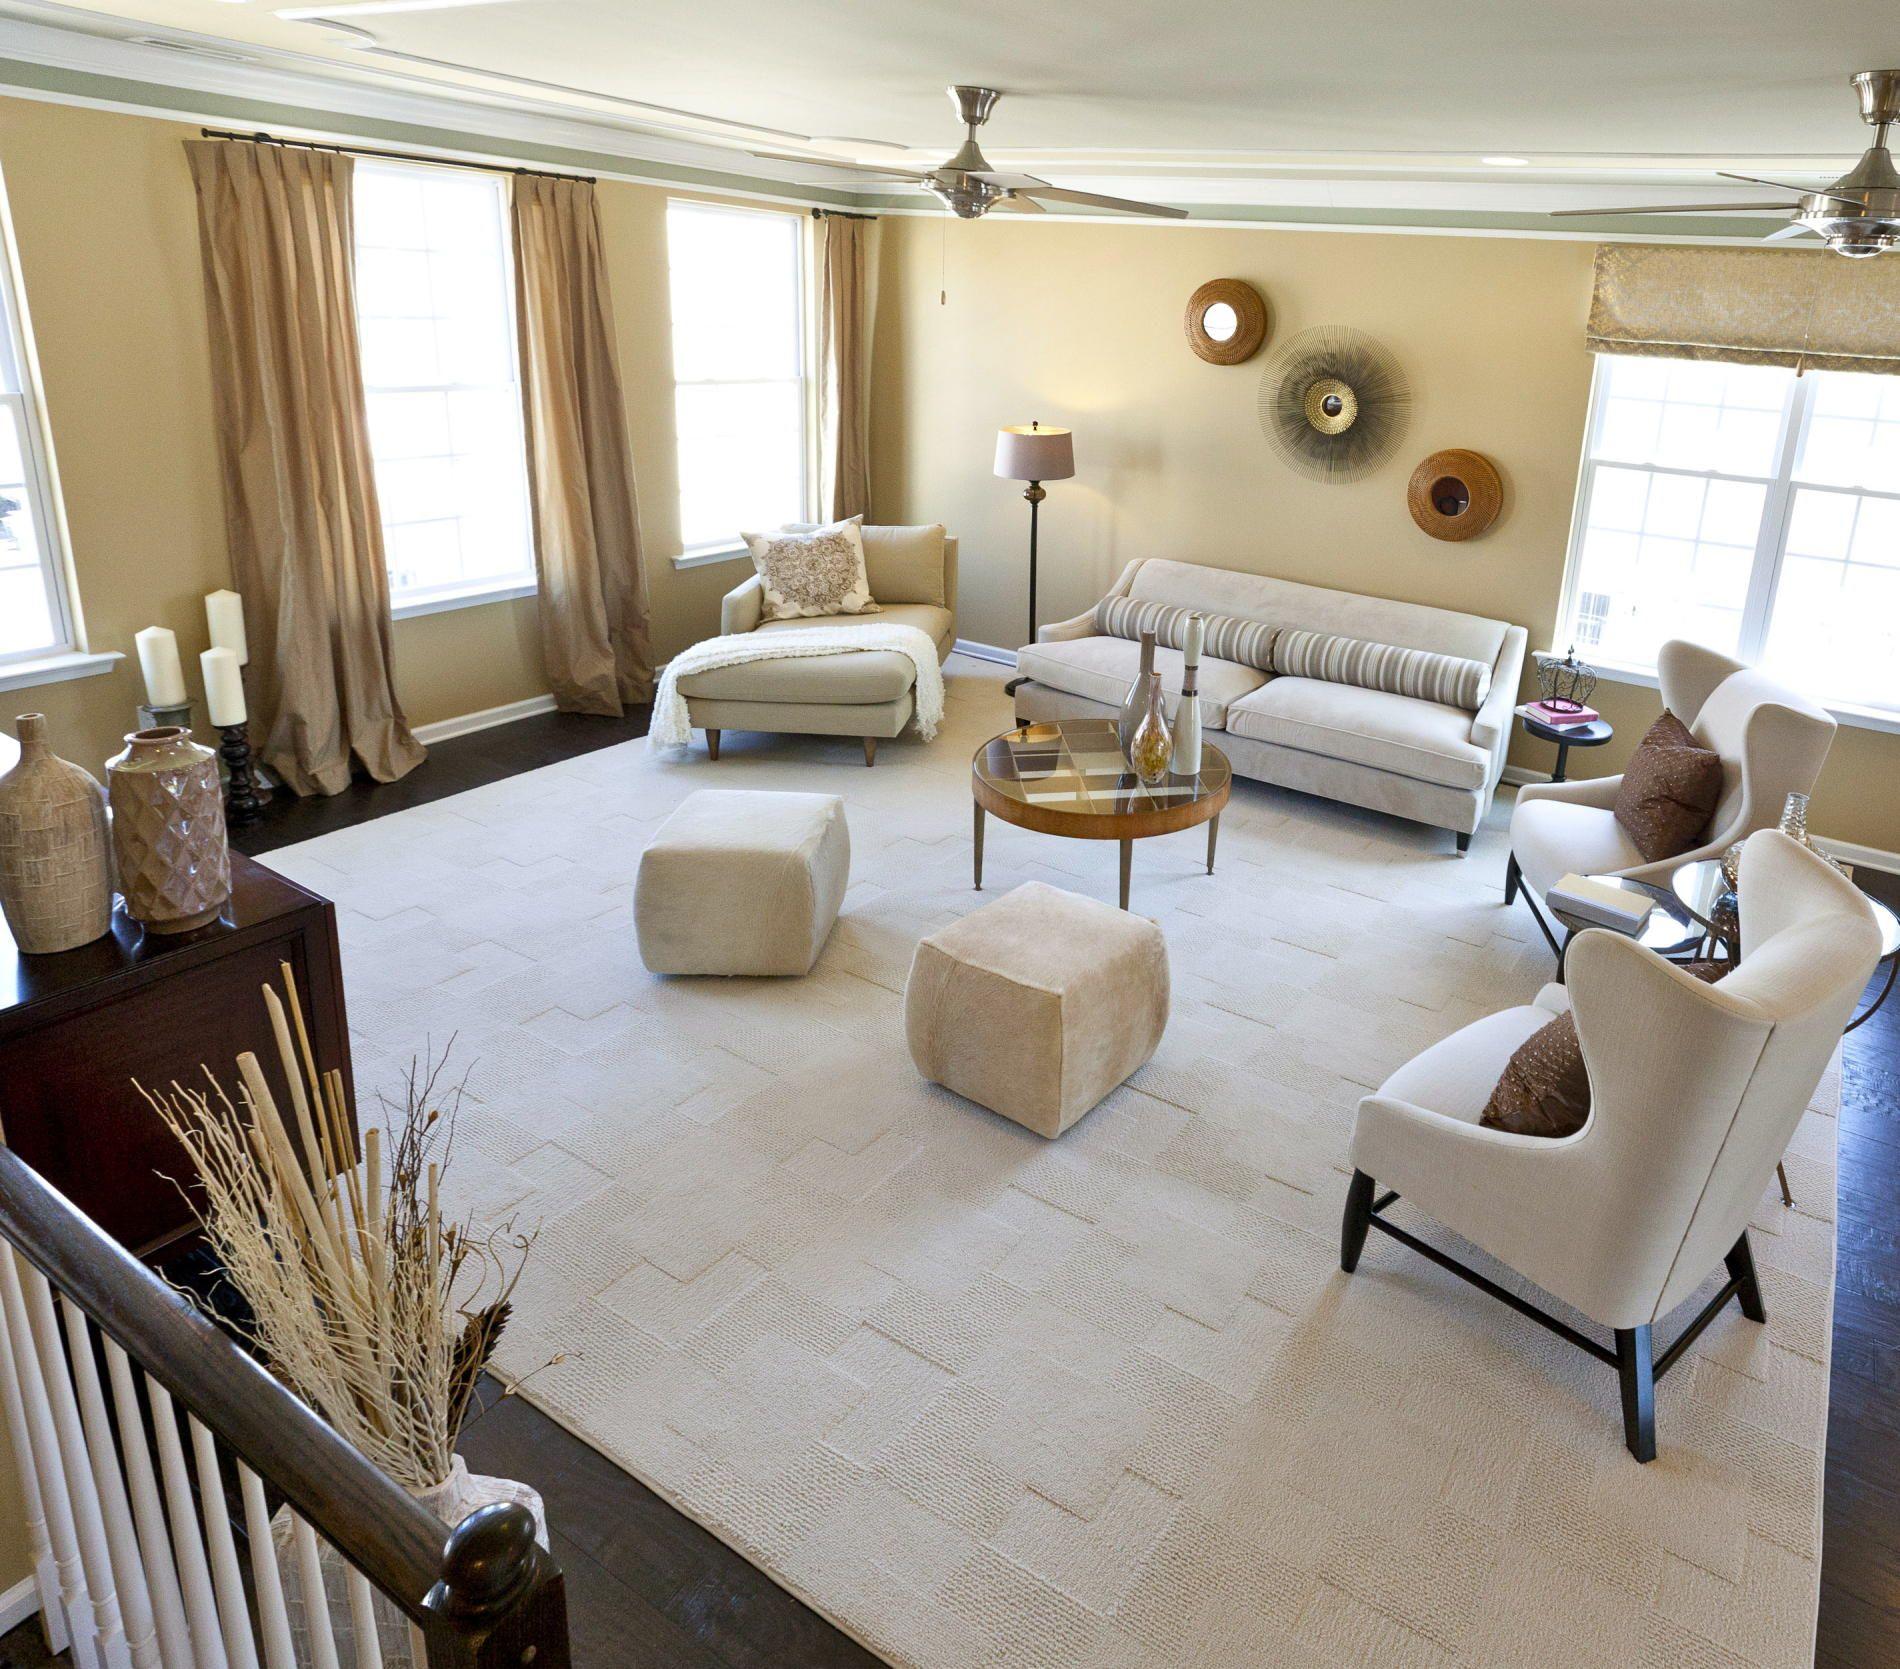 Hgtv Designs For Living Room Classy Hgtv Designers Portfolio  Wallpaper Hgtv Designer Portfolio Design Inspiration